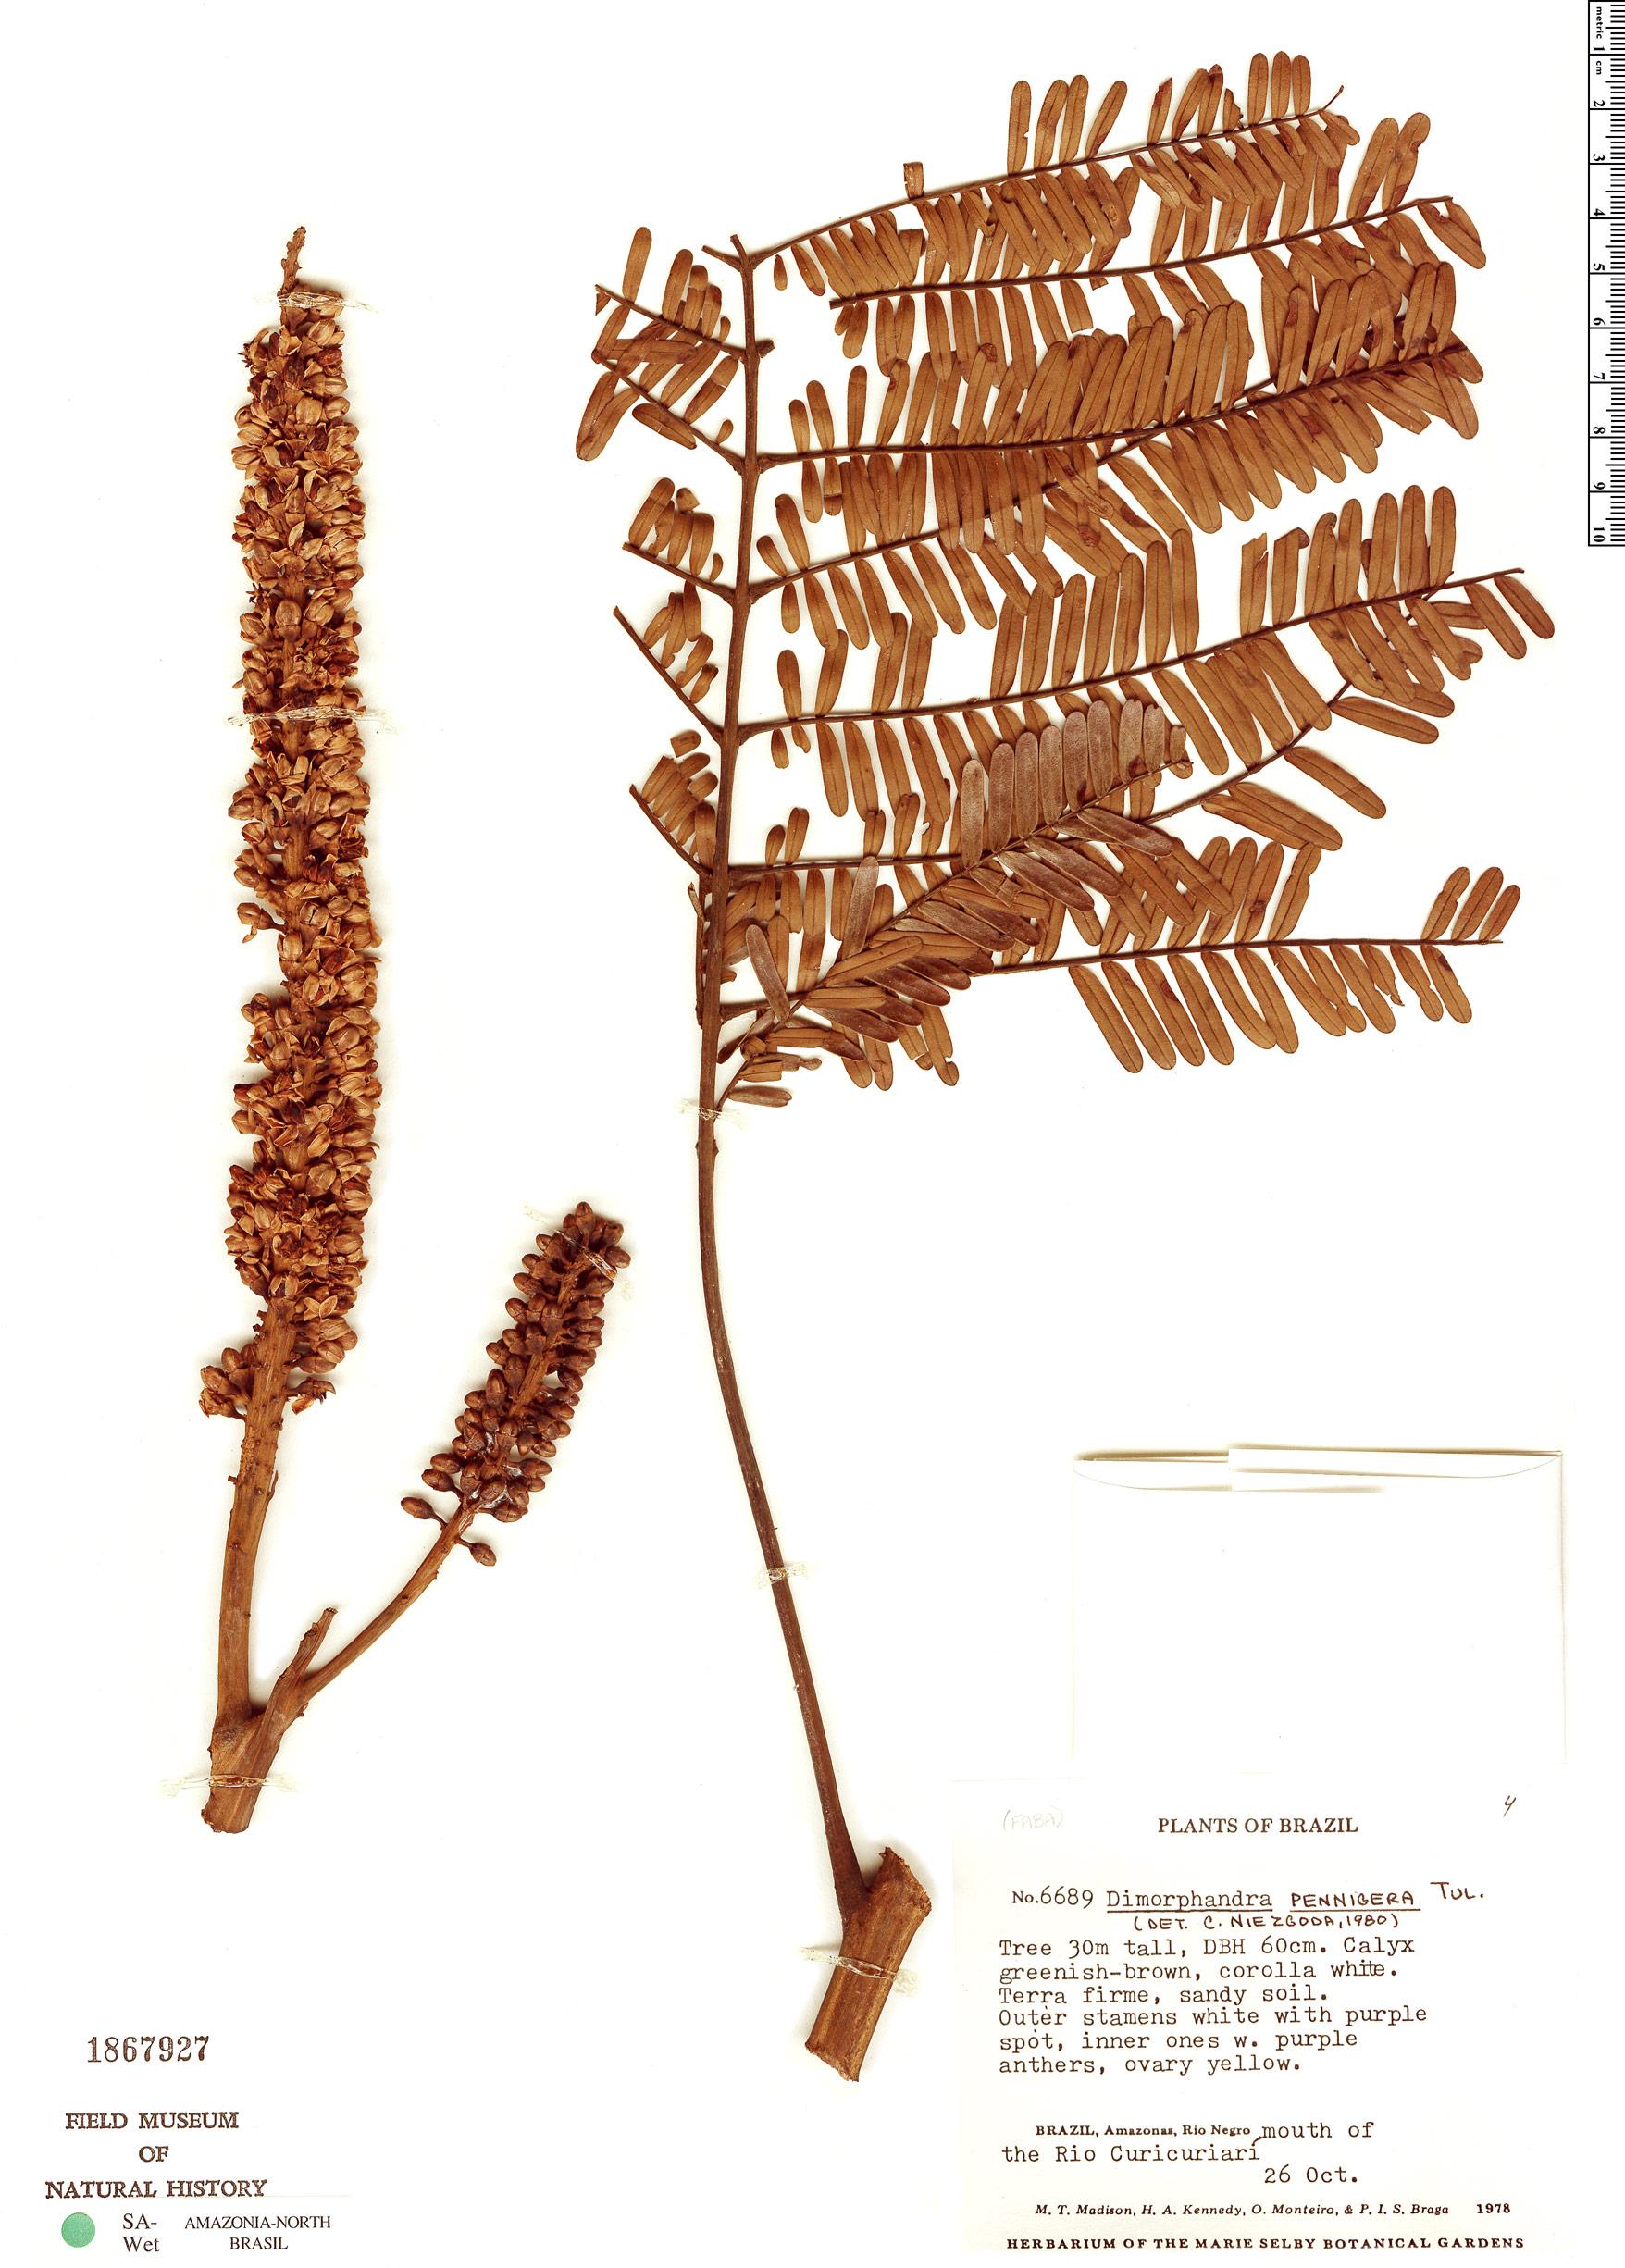 Specimen: Dimorphandra pennigera